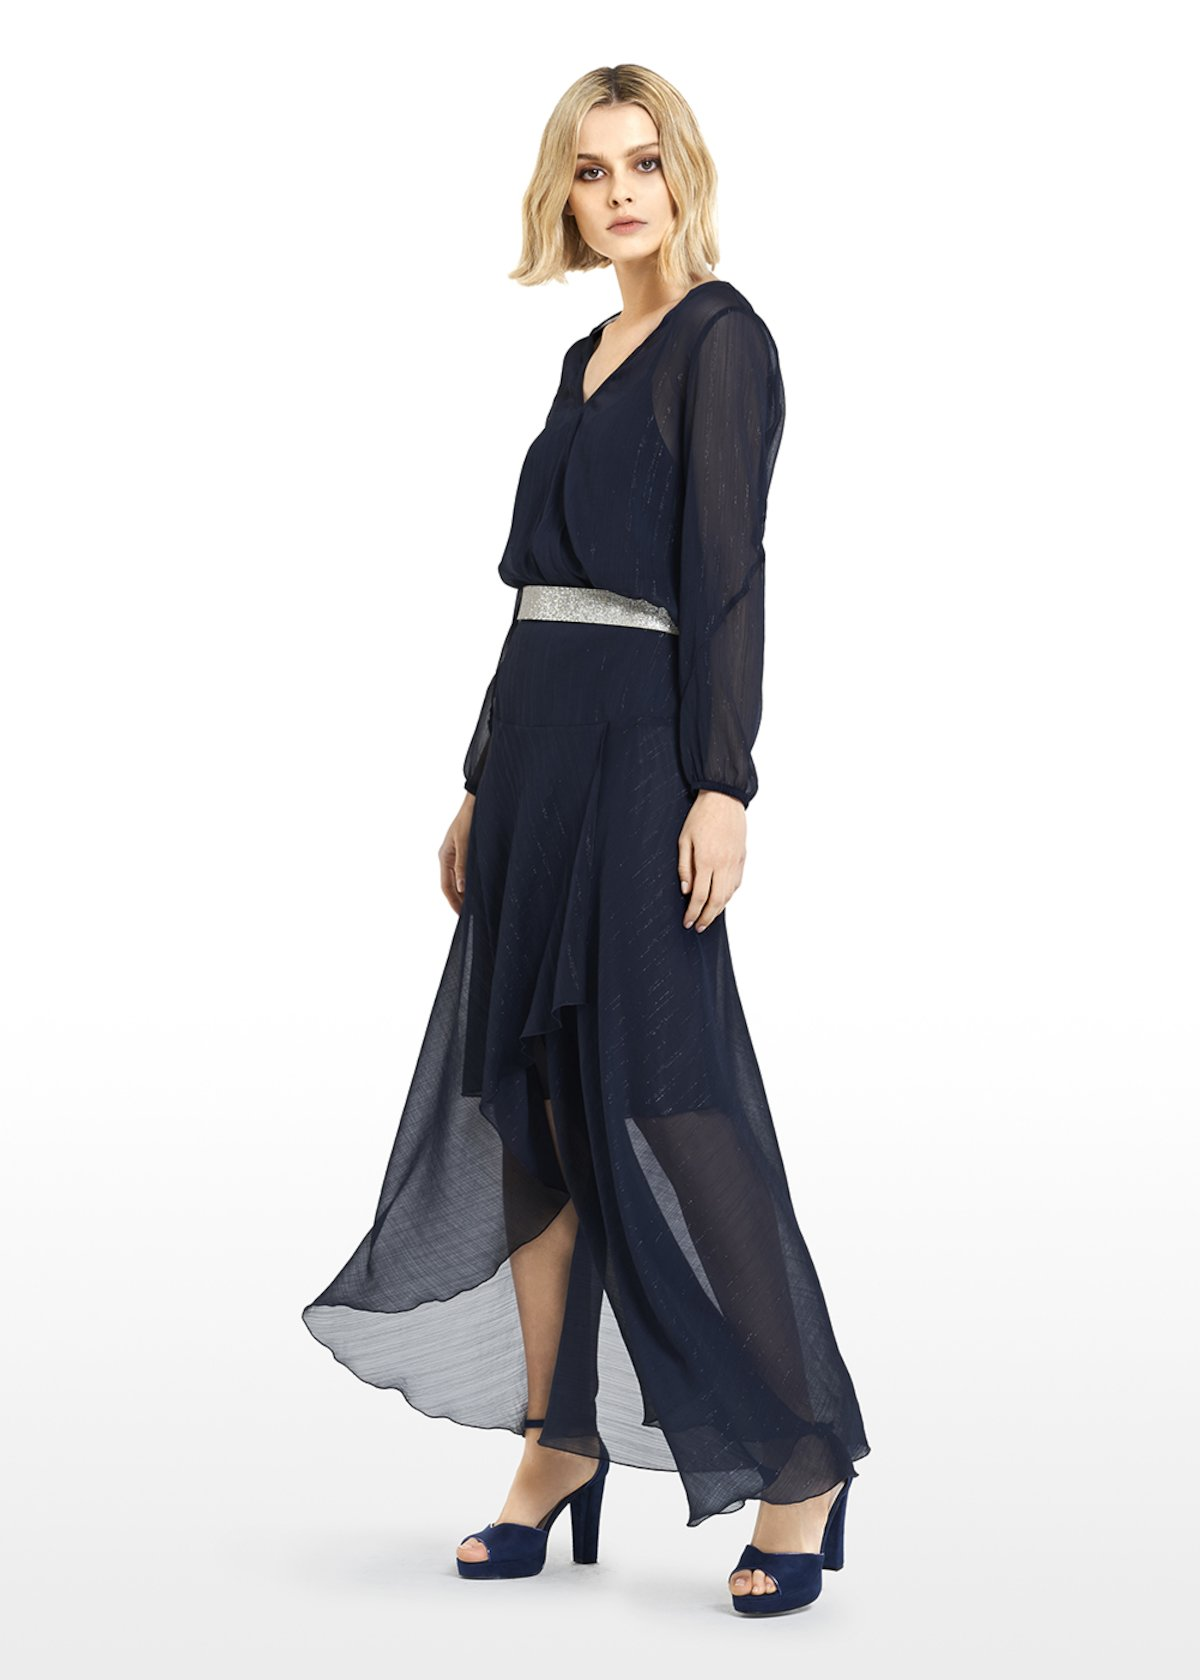 Carolina blouse stripes lurex effect - Dark Blue - Woman - Category image